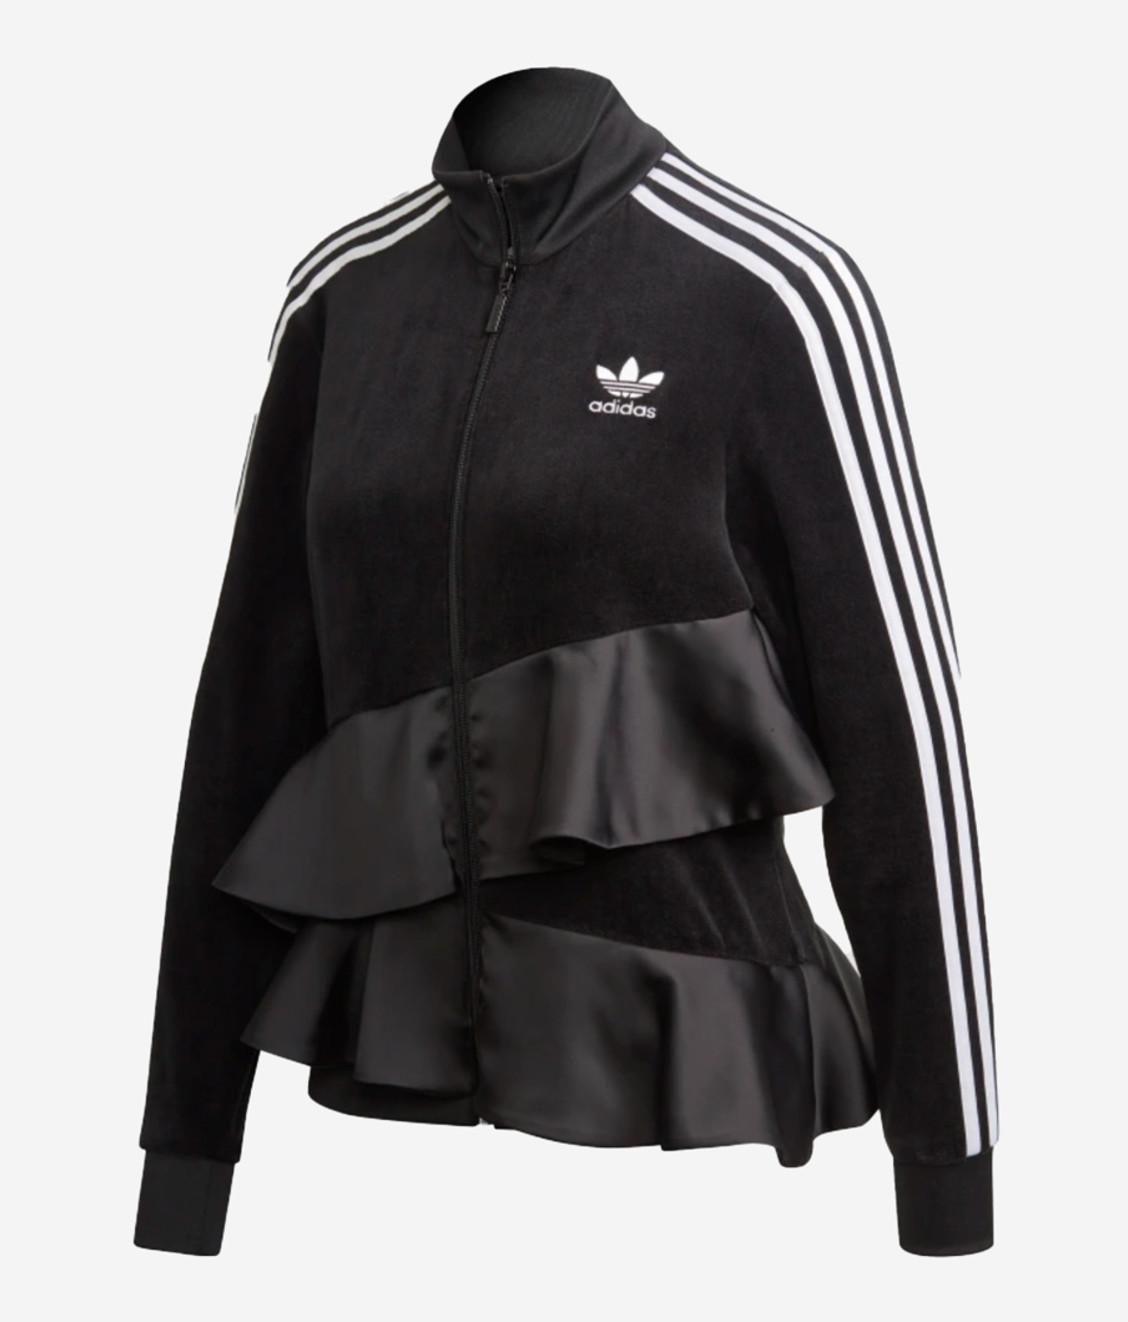 Adidas Adidas x J KOO Track Top Black